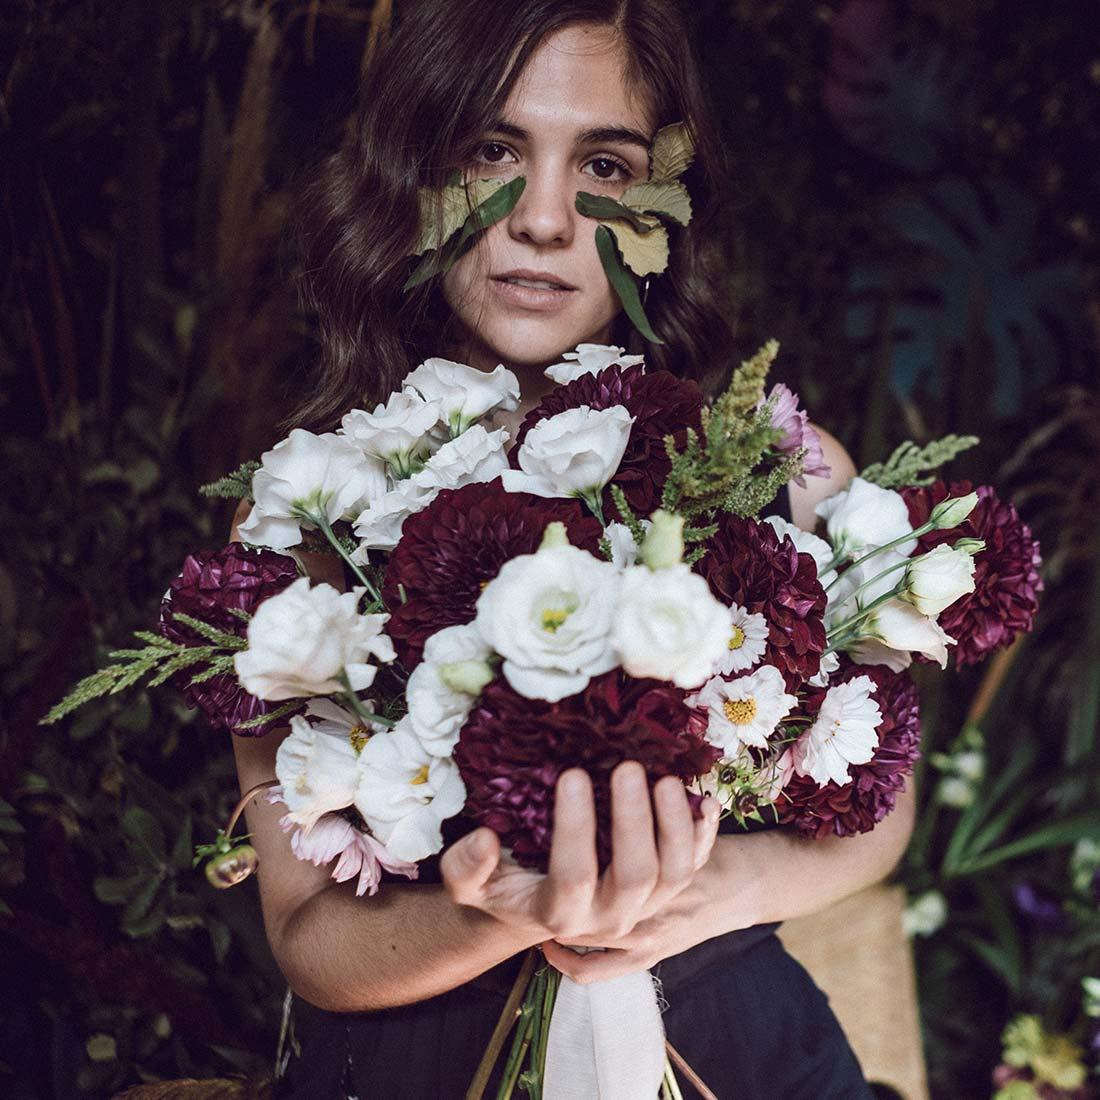 Modelo ofreciendo un ramo de flores